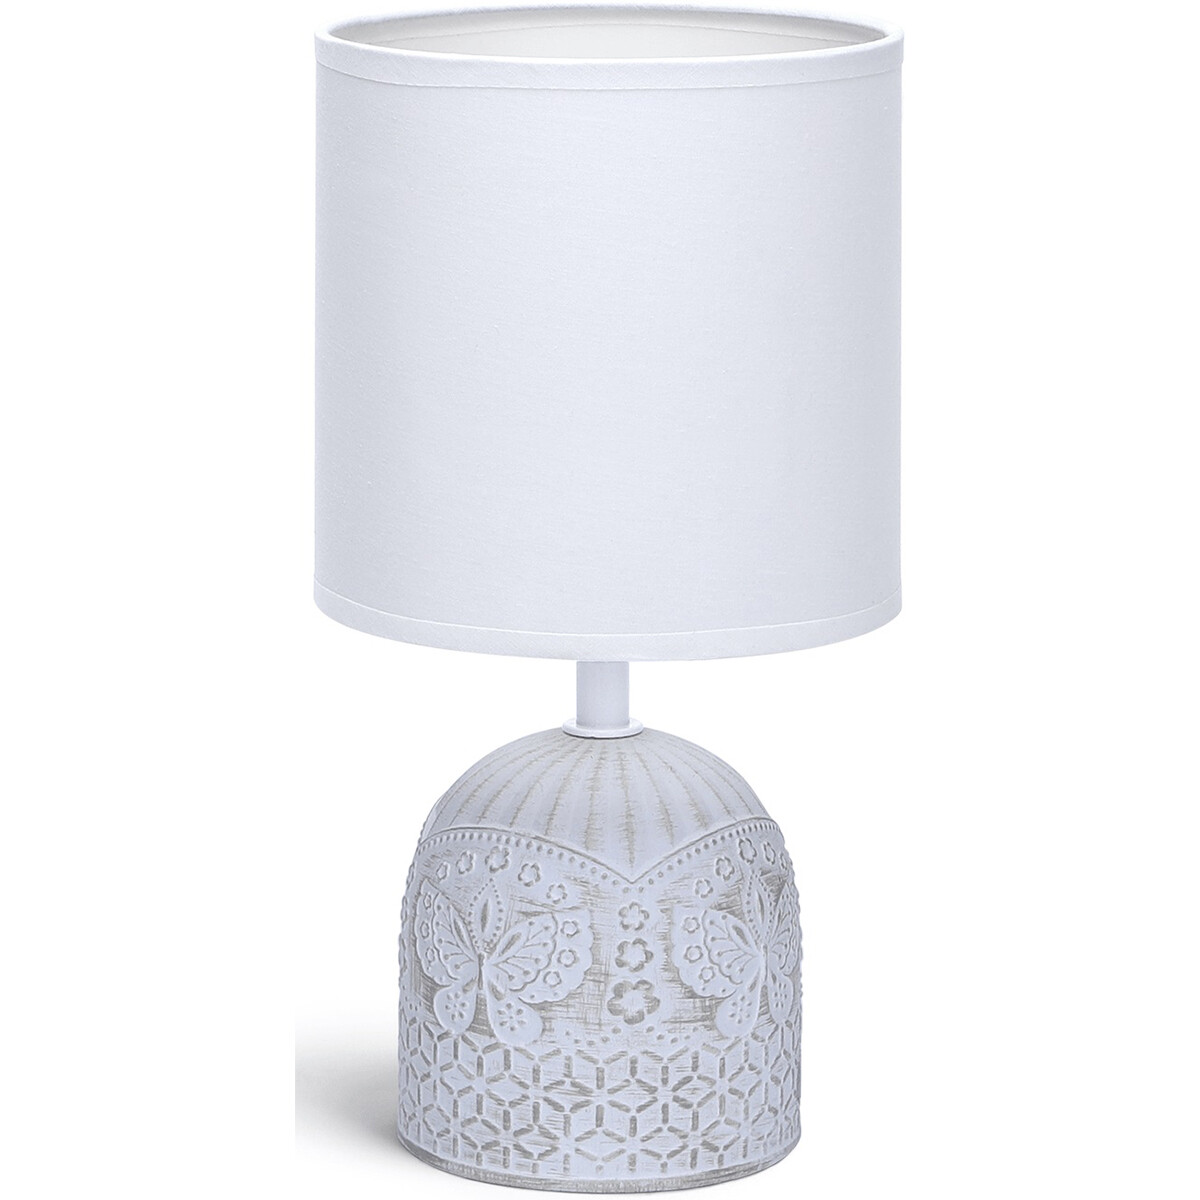 LED Tafellamp - Tafelverlichting - Aigi Cruni - E14 Fitting - Rond - Mat Wit - Keramiek